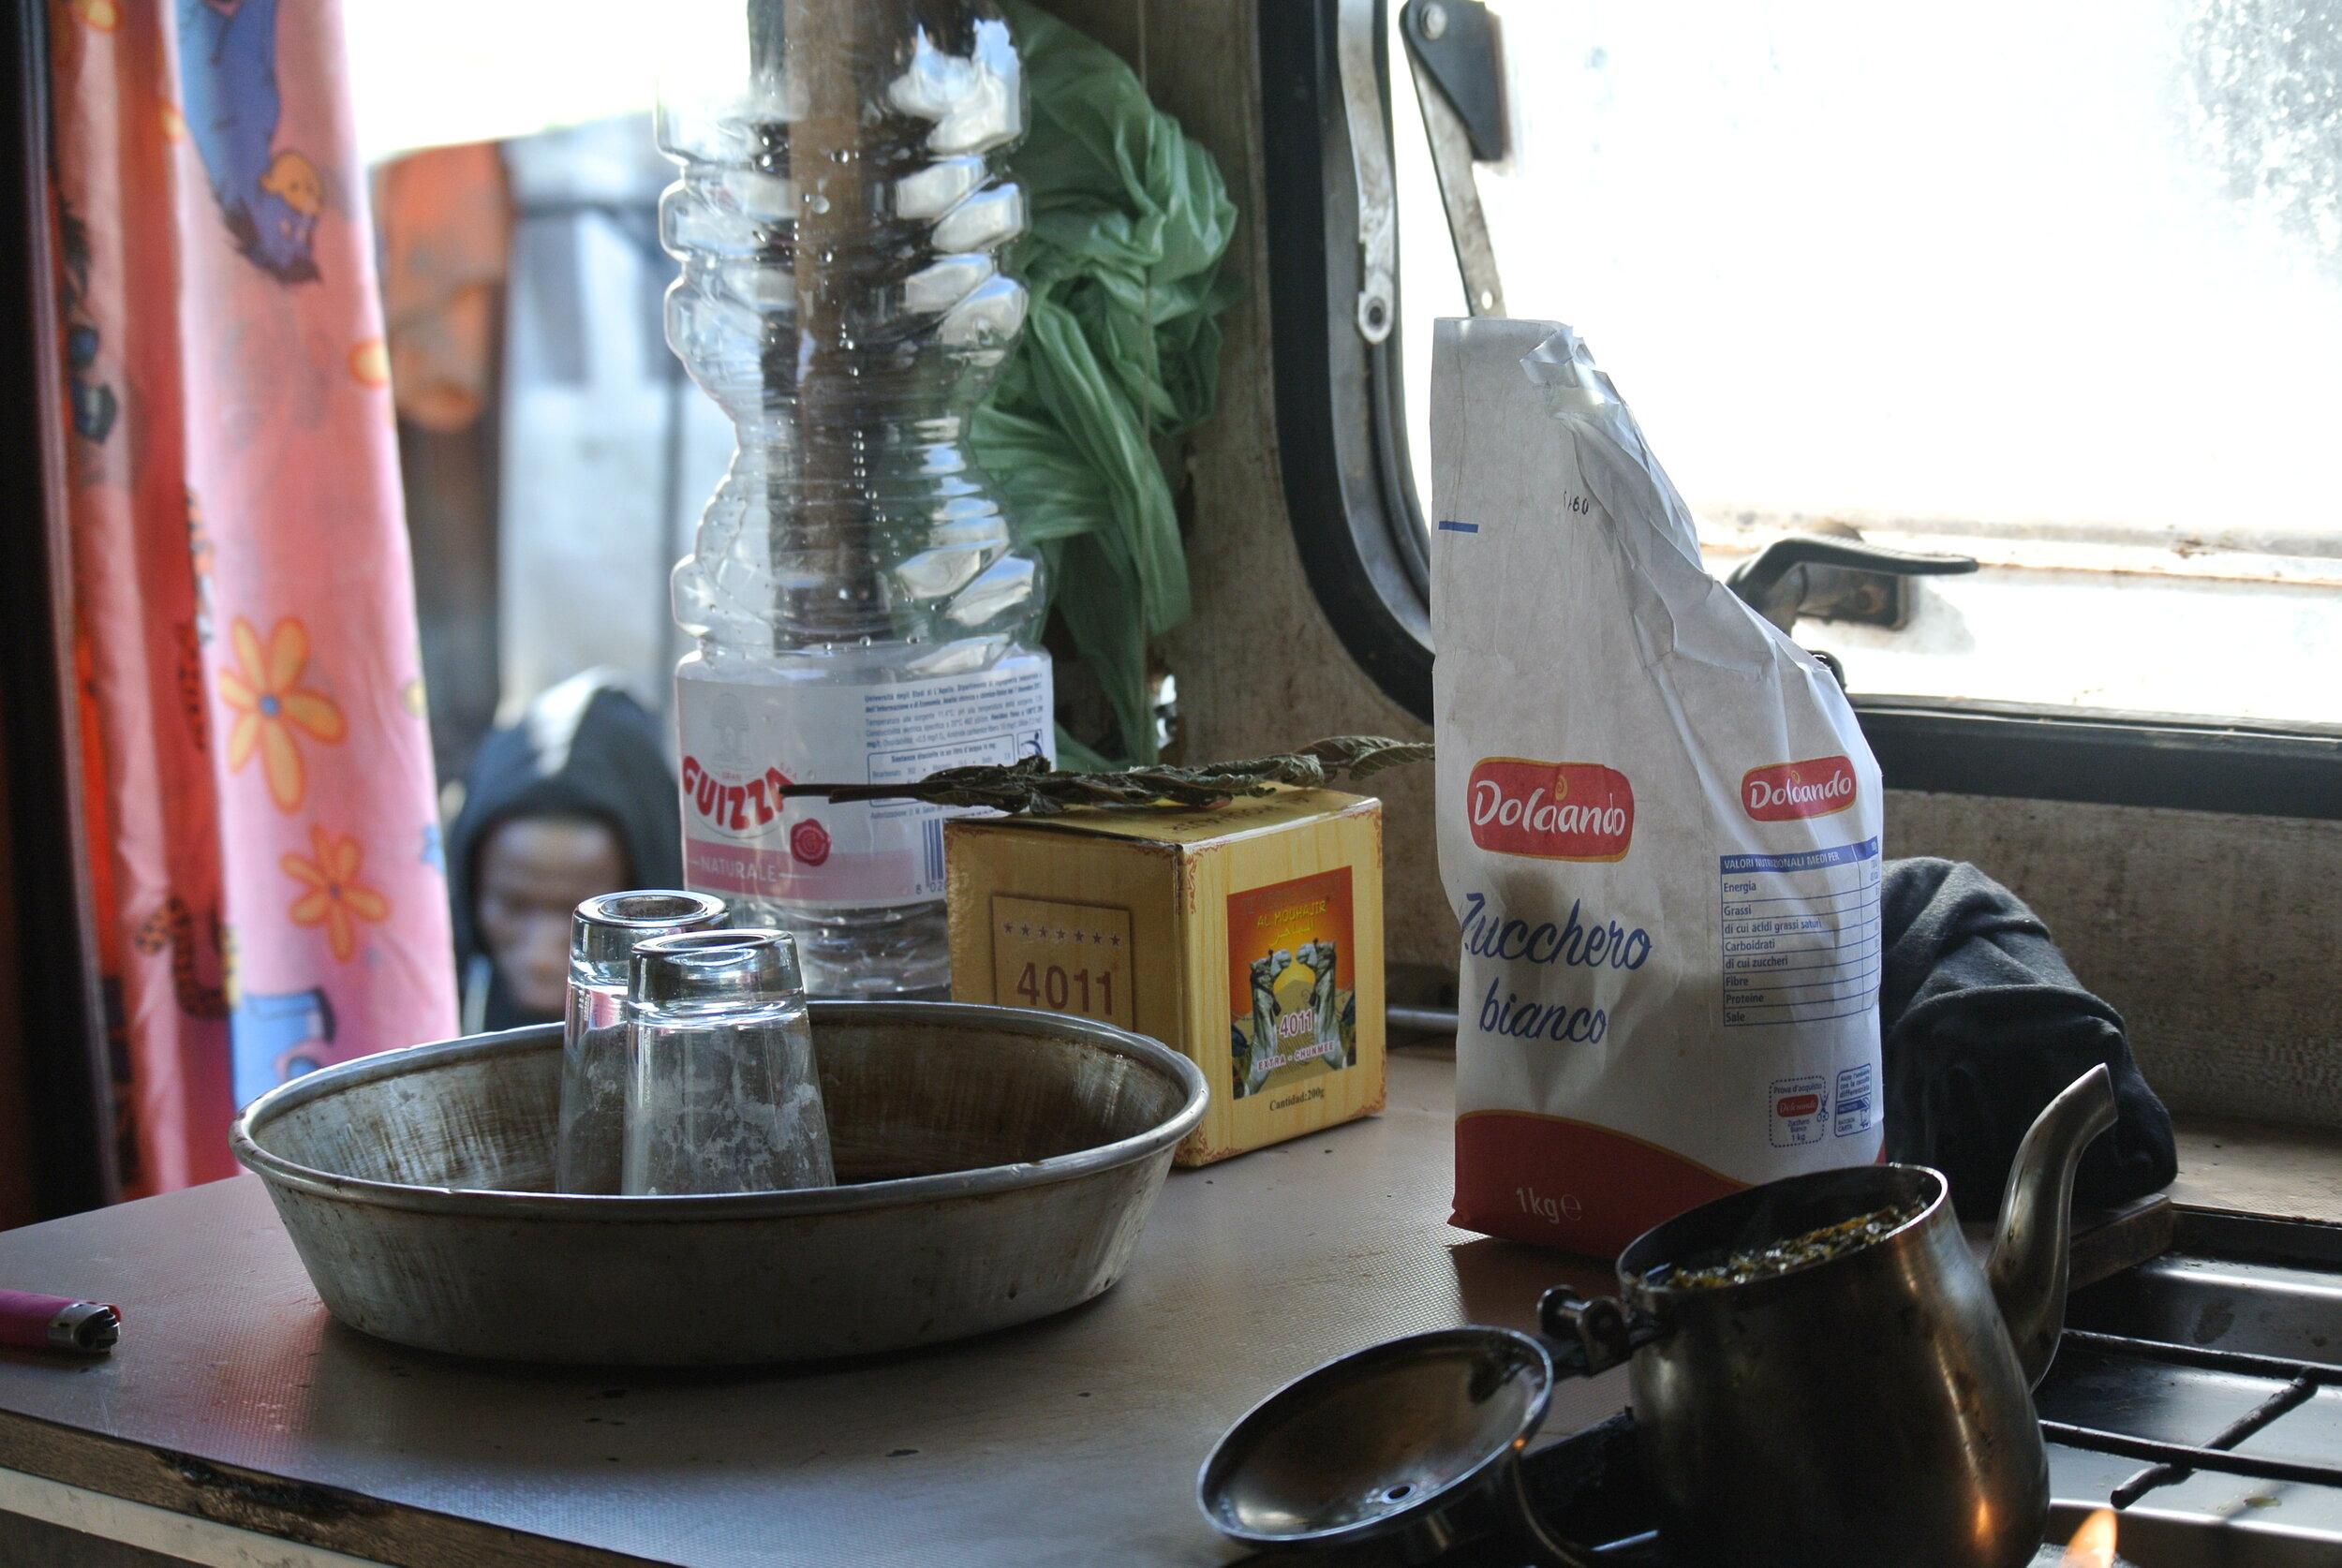 Tea service: inside Peter's container. Foggia, Italy. 8 October 2019. ©Pamela Kerpius